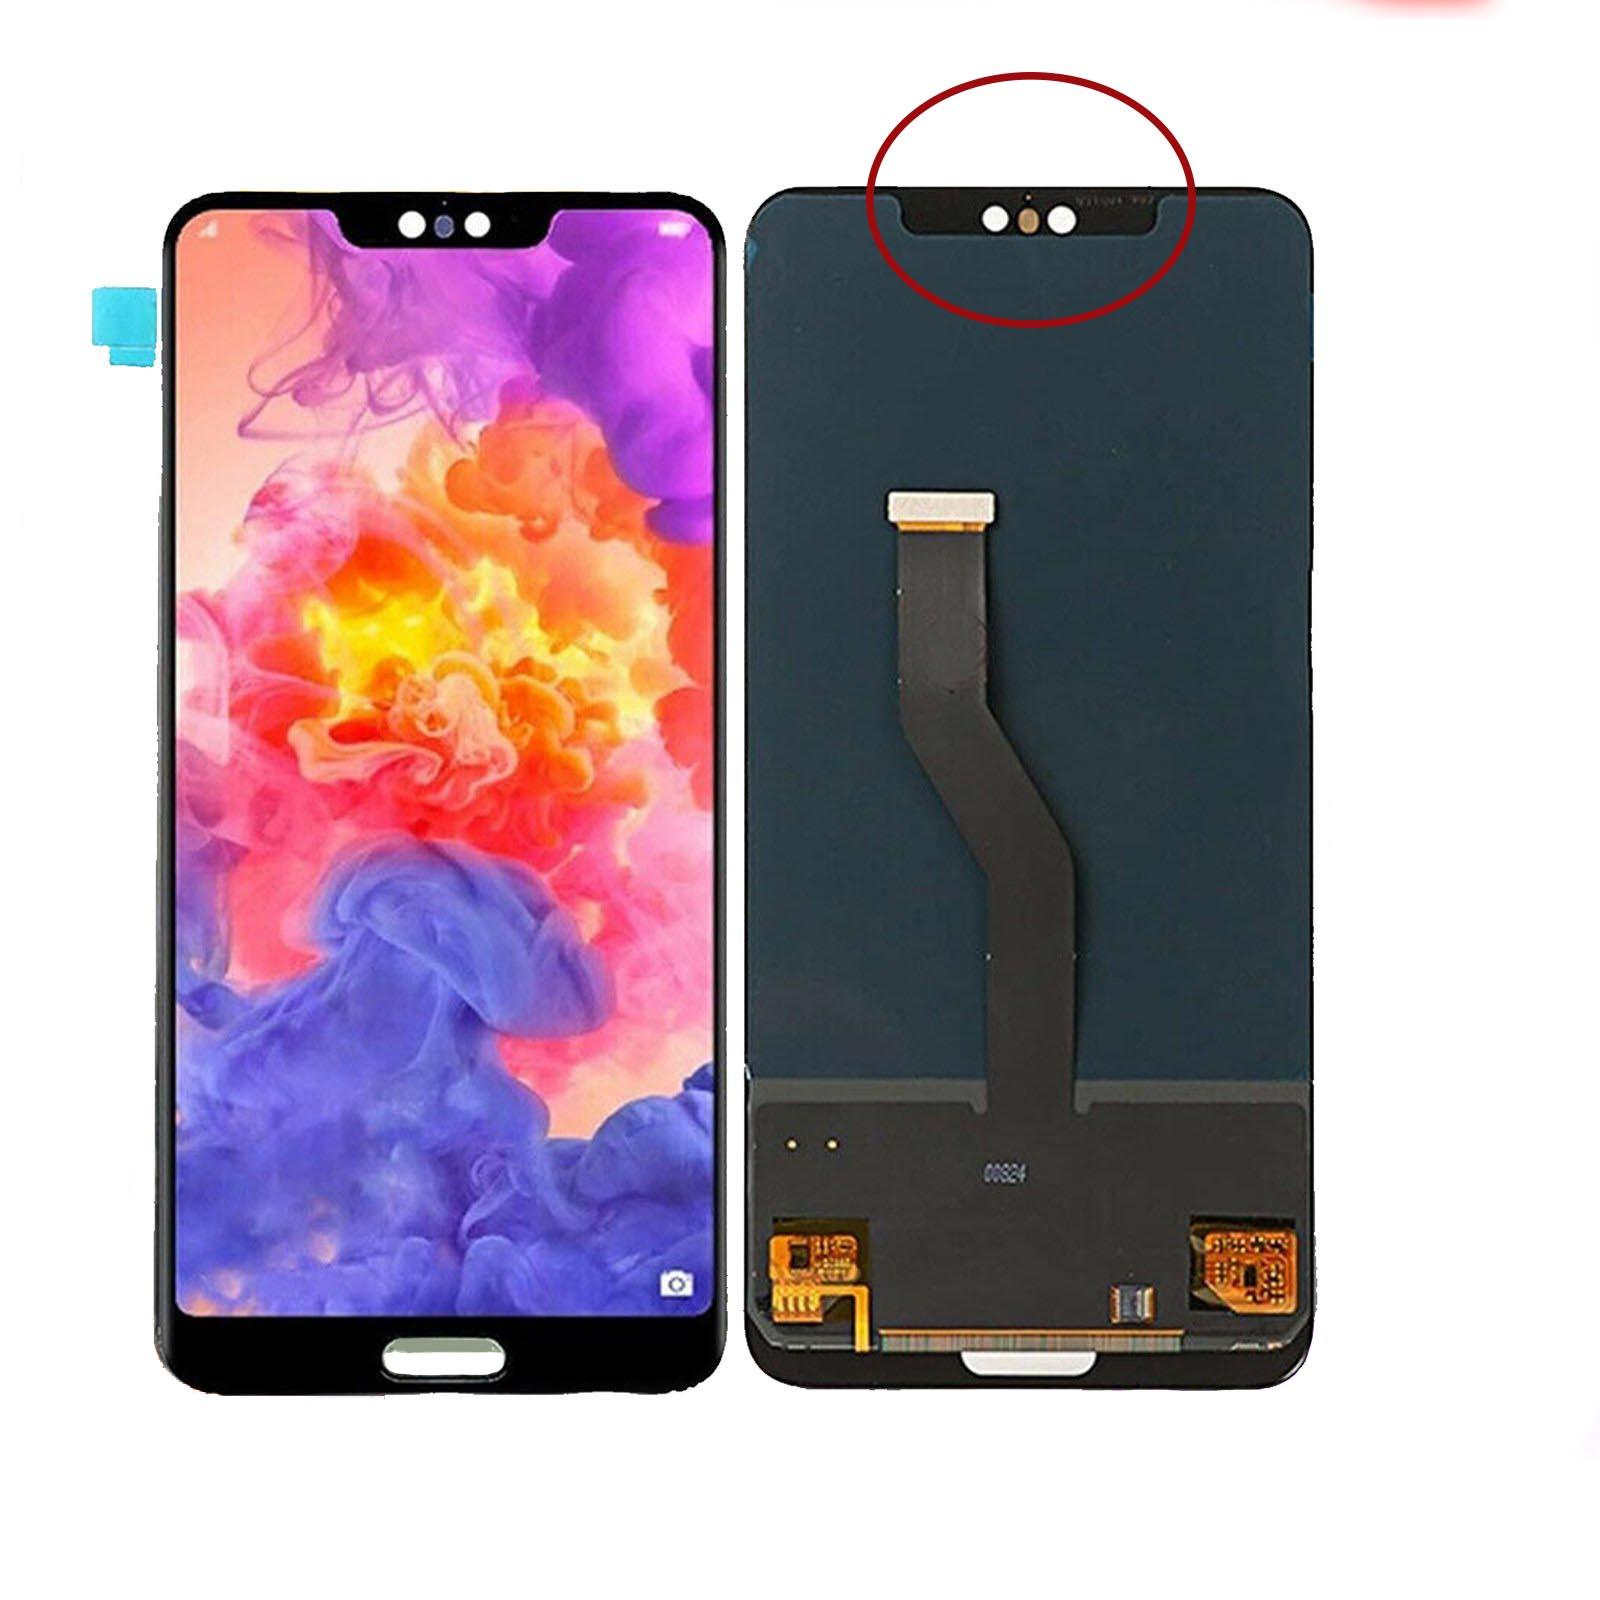 https://www.mondonotebook.it/7545/iphone-5s-sim-tray-gold.jpg